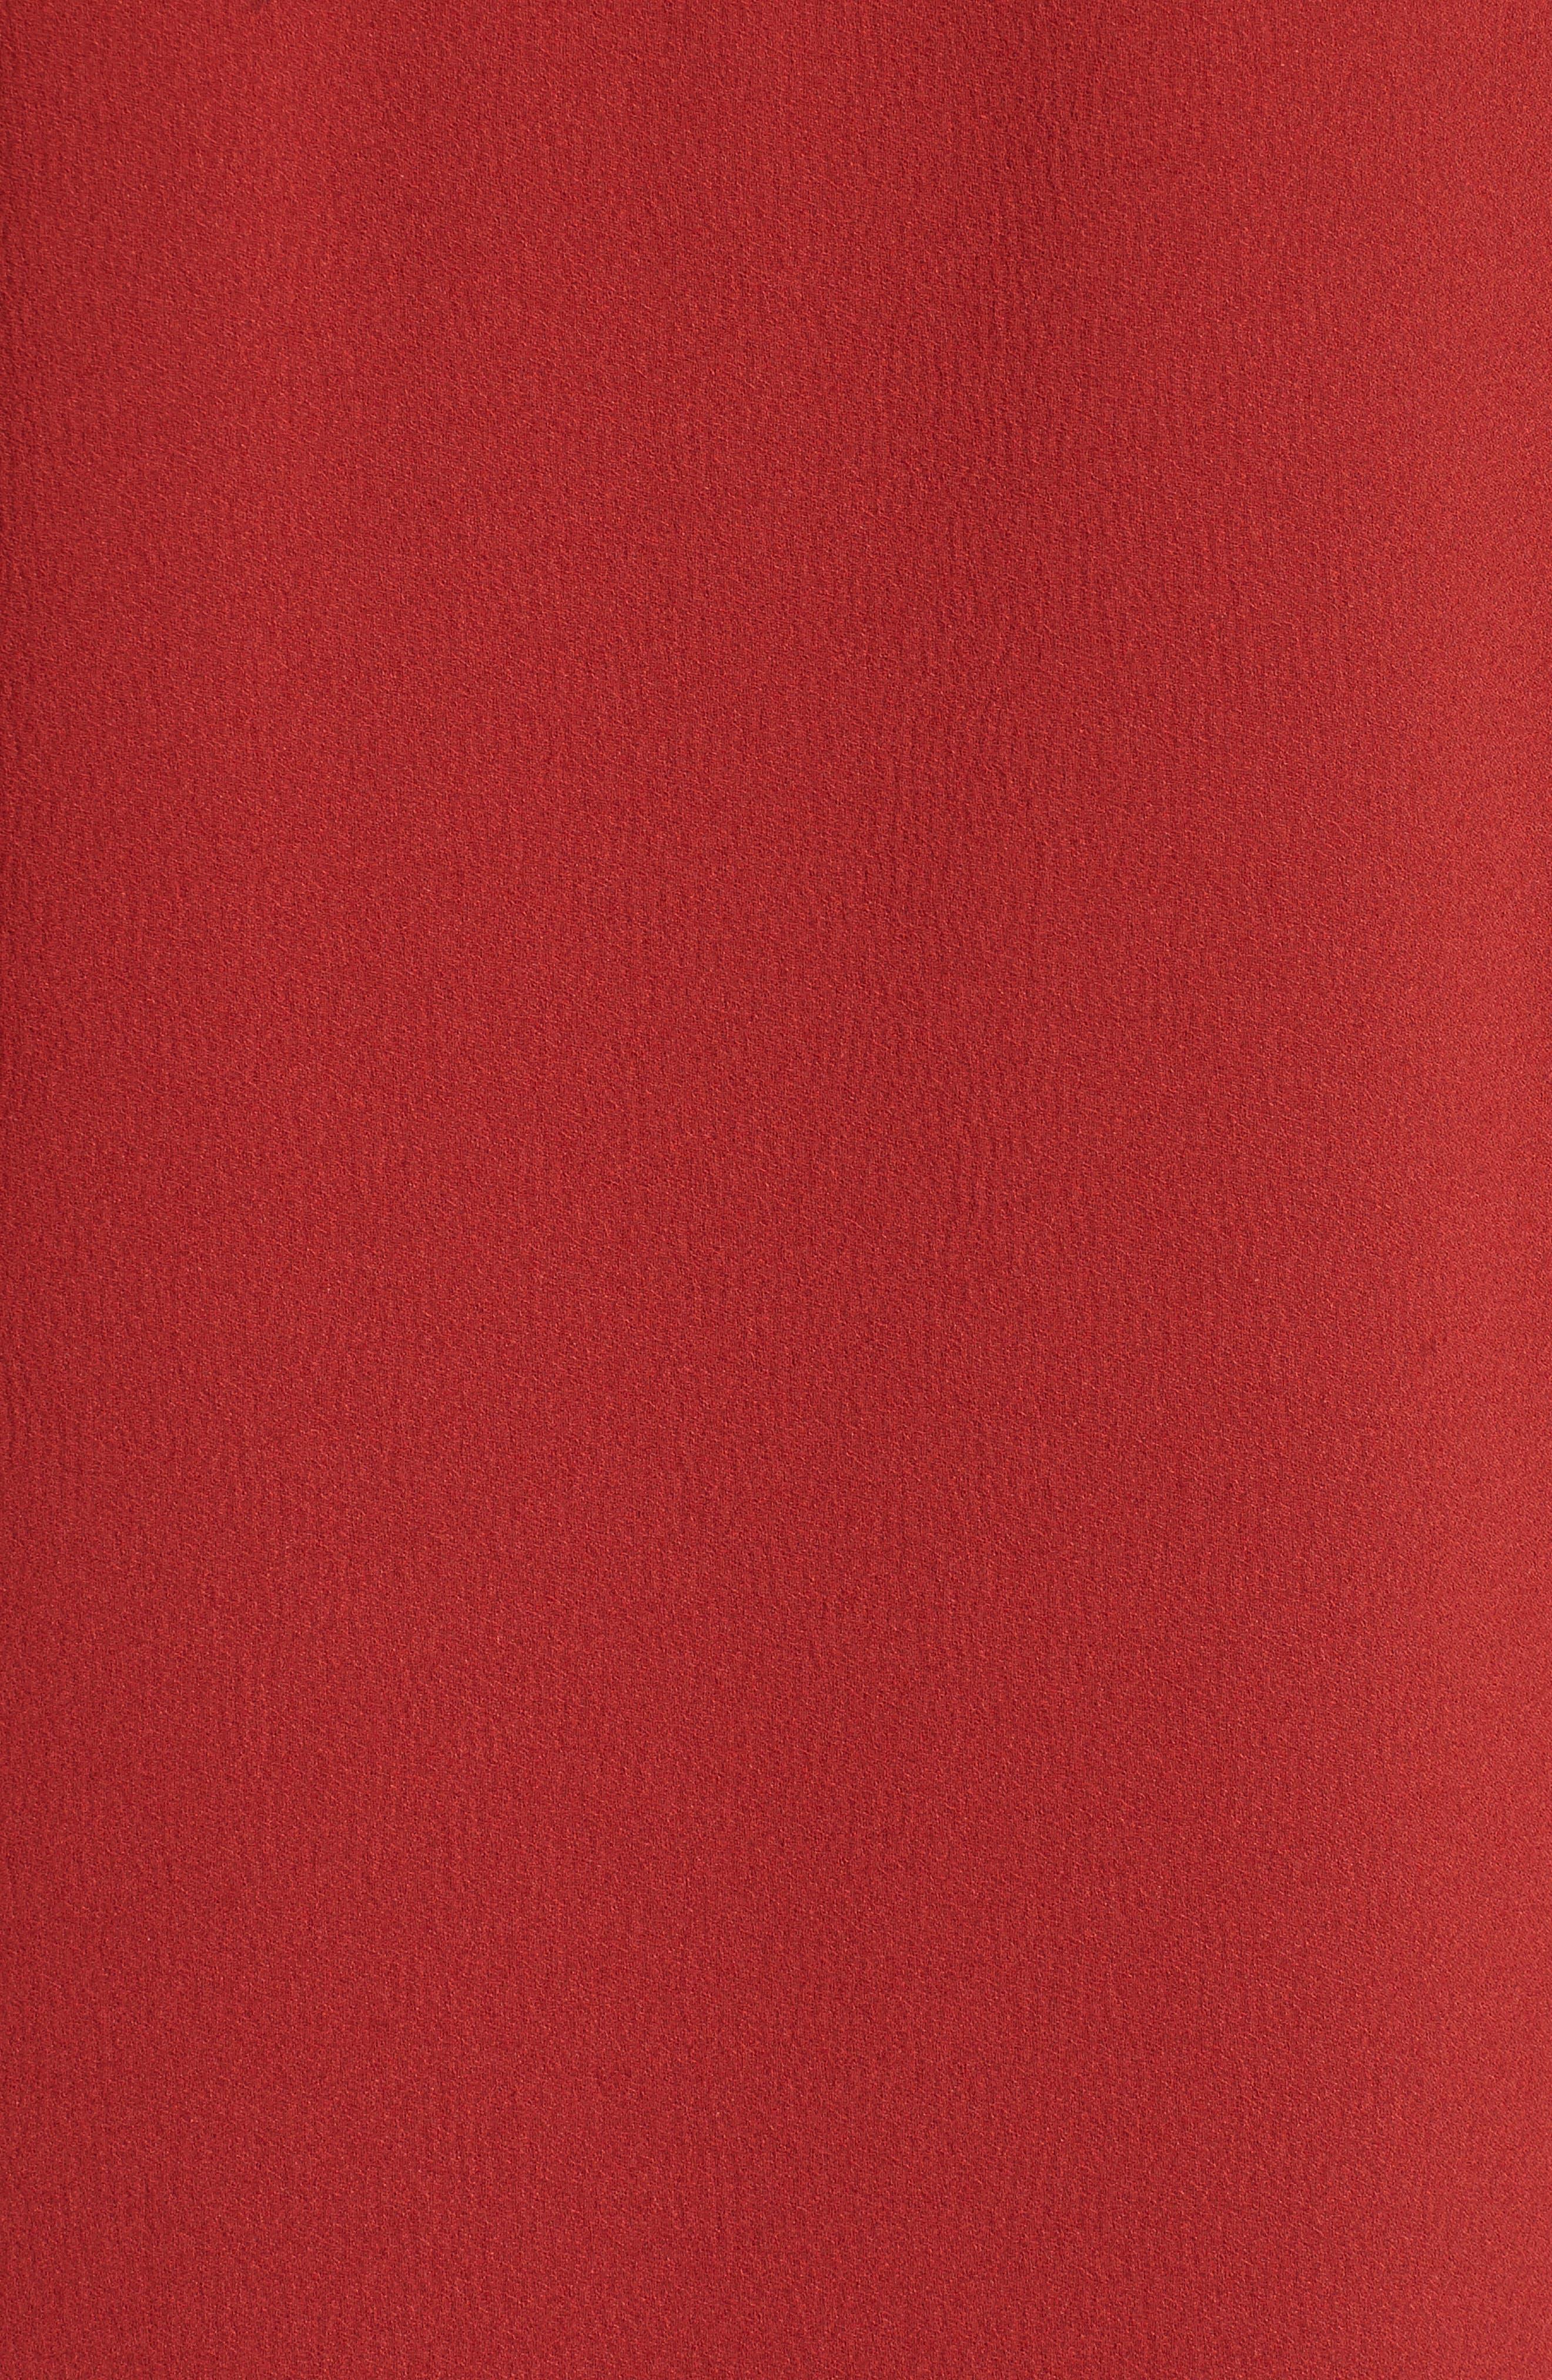 Alternate Image 3  - Marni Crepe Asymmetrical Dress